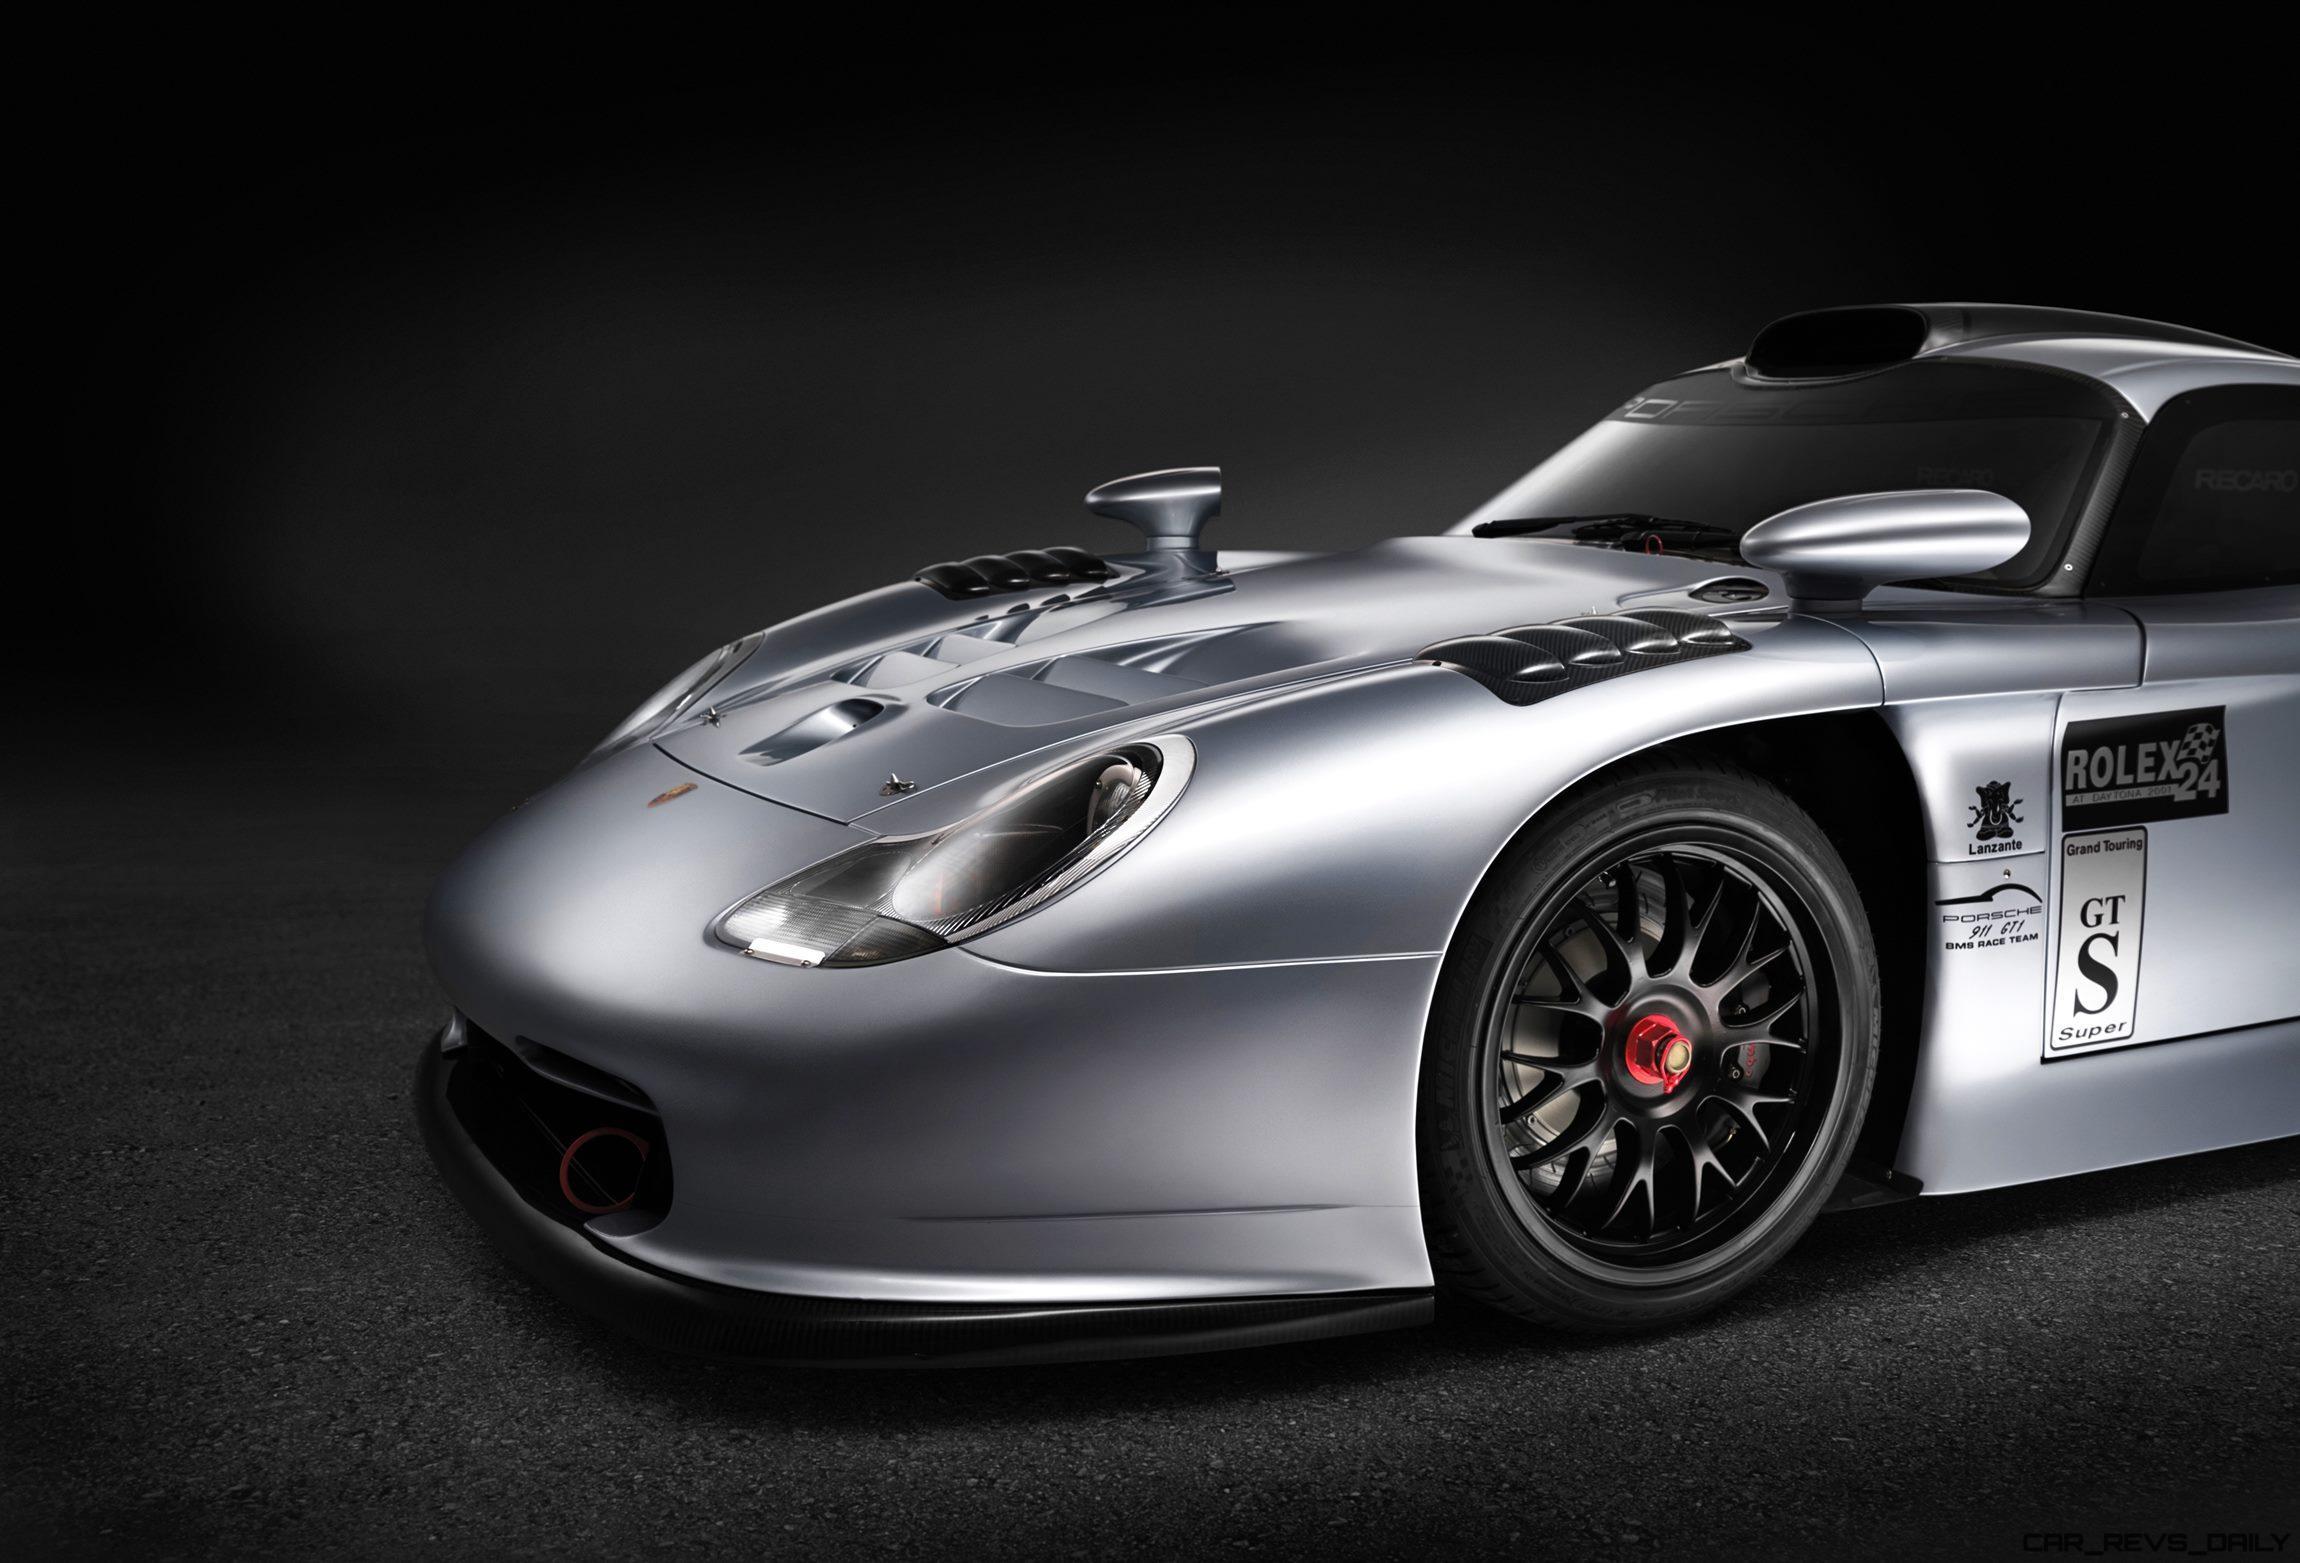 1997-Porsche-911-GT1-Evolution-15 Terrific Porsche 911 Gt1 98 Road Car Cars Trend